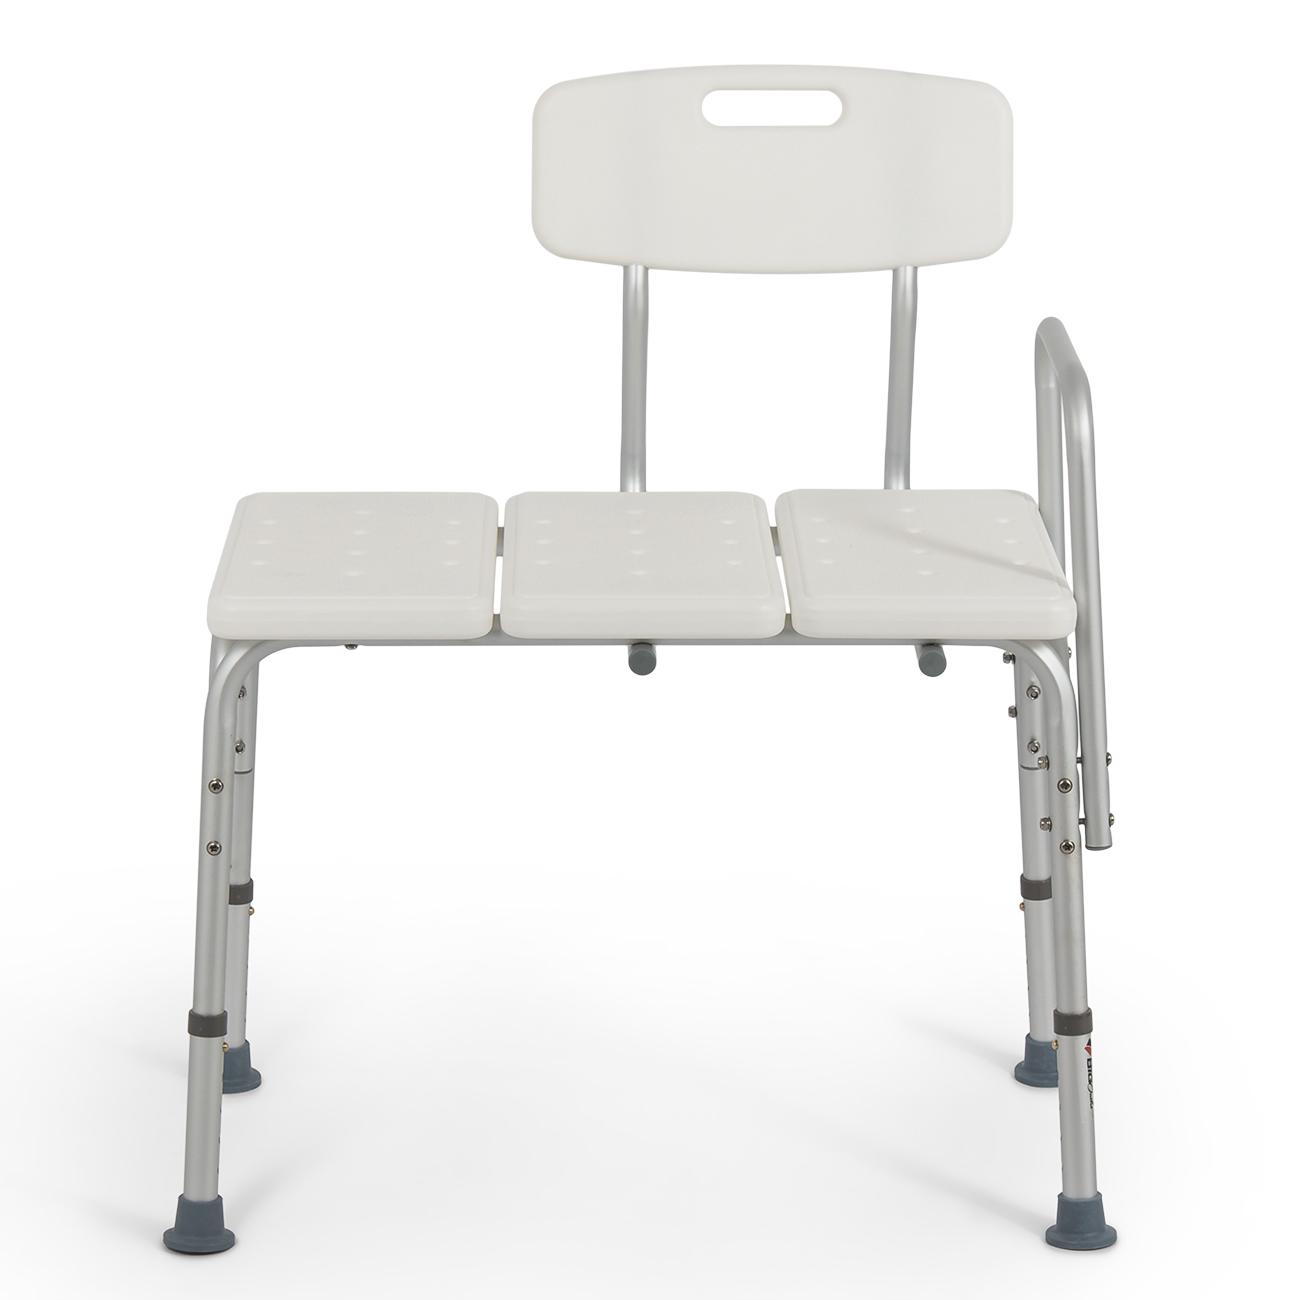 New Medical Shower Chair Bath Tub Bench Stool Seat Back